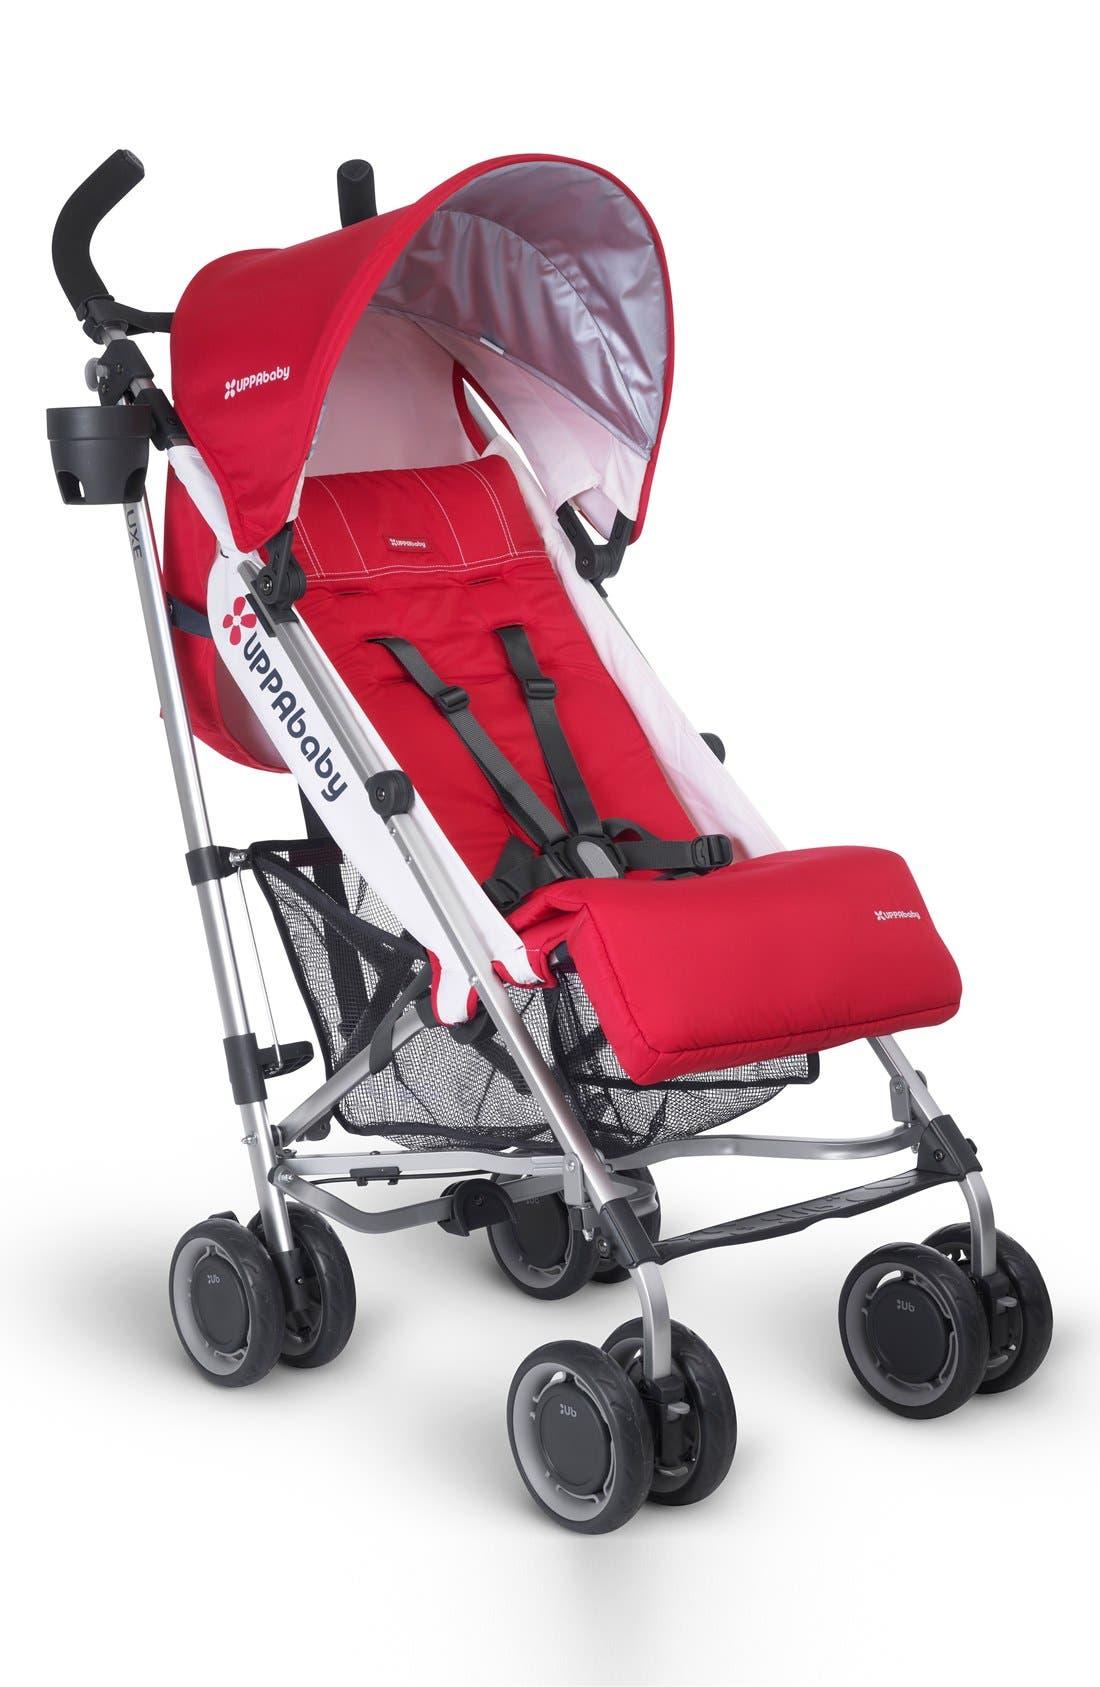 2015 G-LUXE - Aluminum Frame Reclining Umbrella Stroller,                             Main thumbnail 5, color,